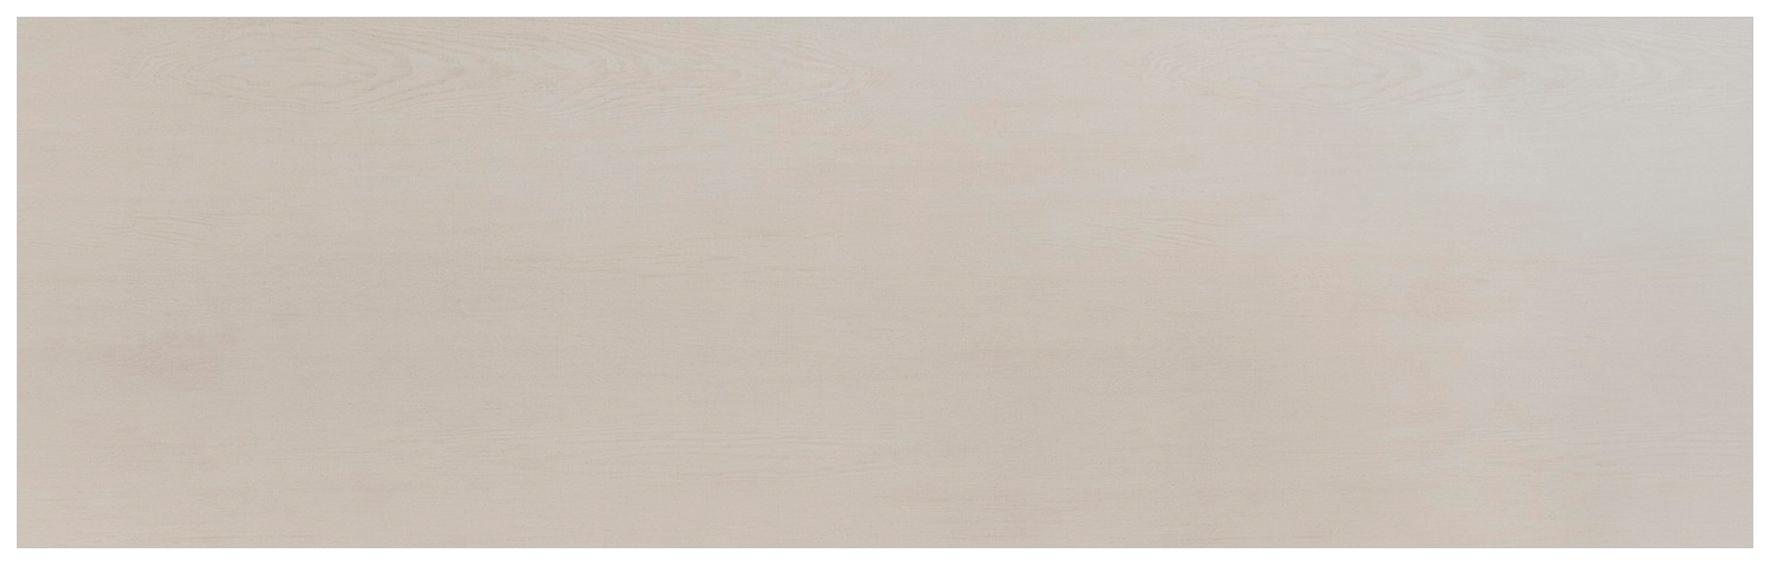 Linfa-Cotone-1000x3000x3mm